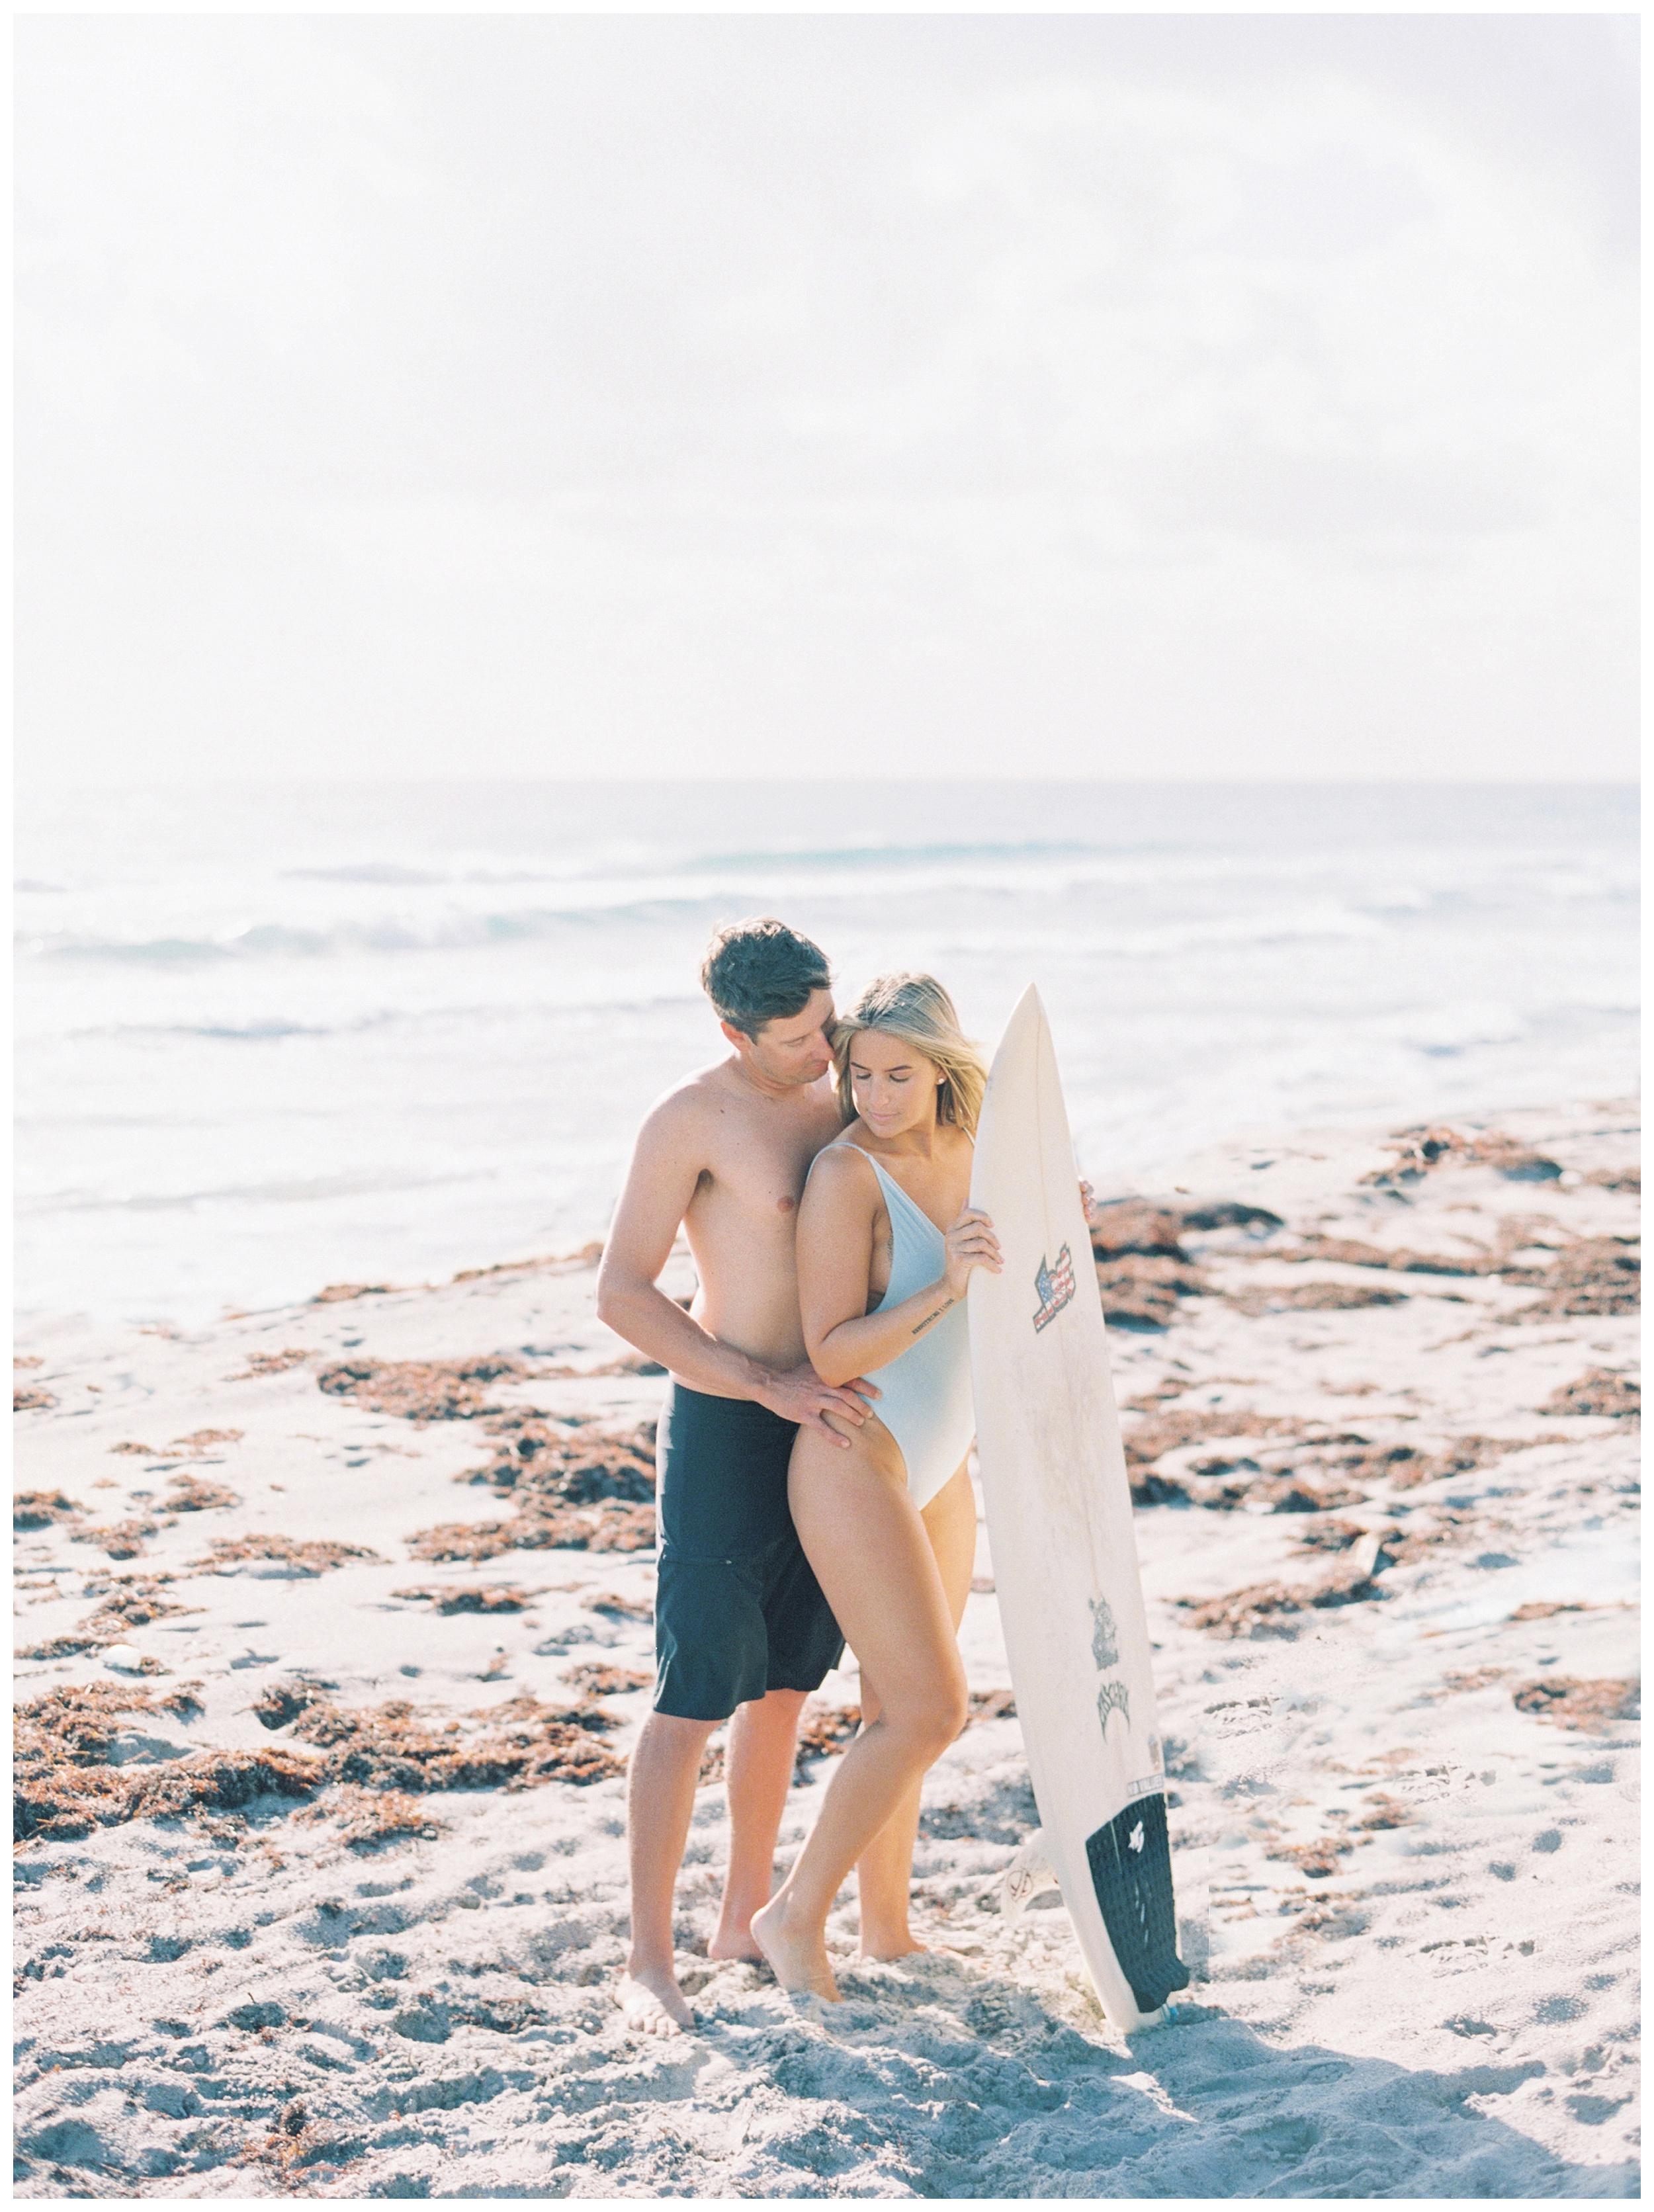 Surfboard Engagement Florida Wedding Photographer Kir Tuben_0003.jpg